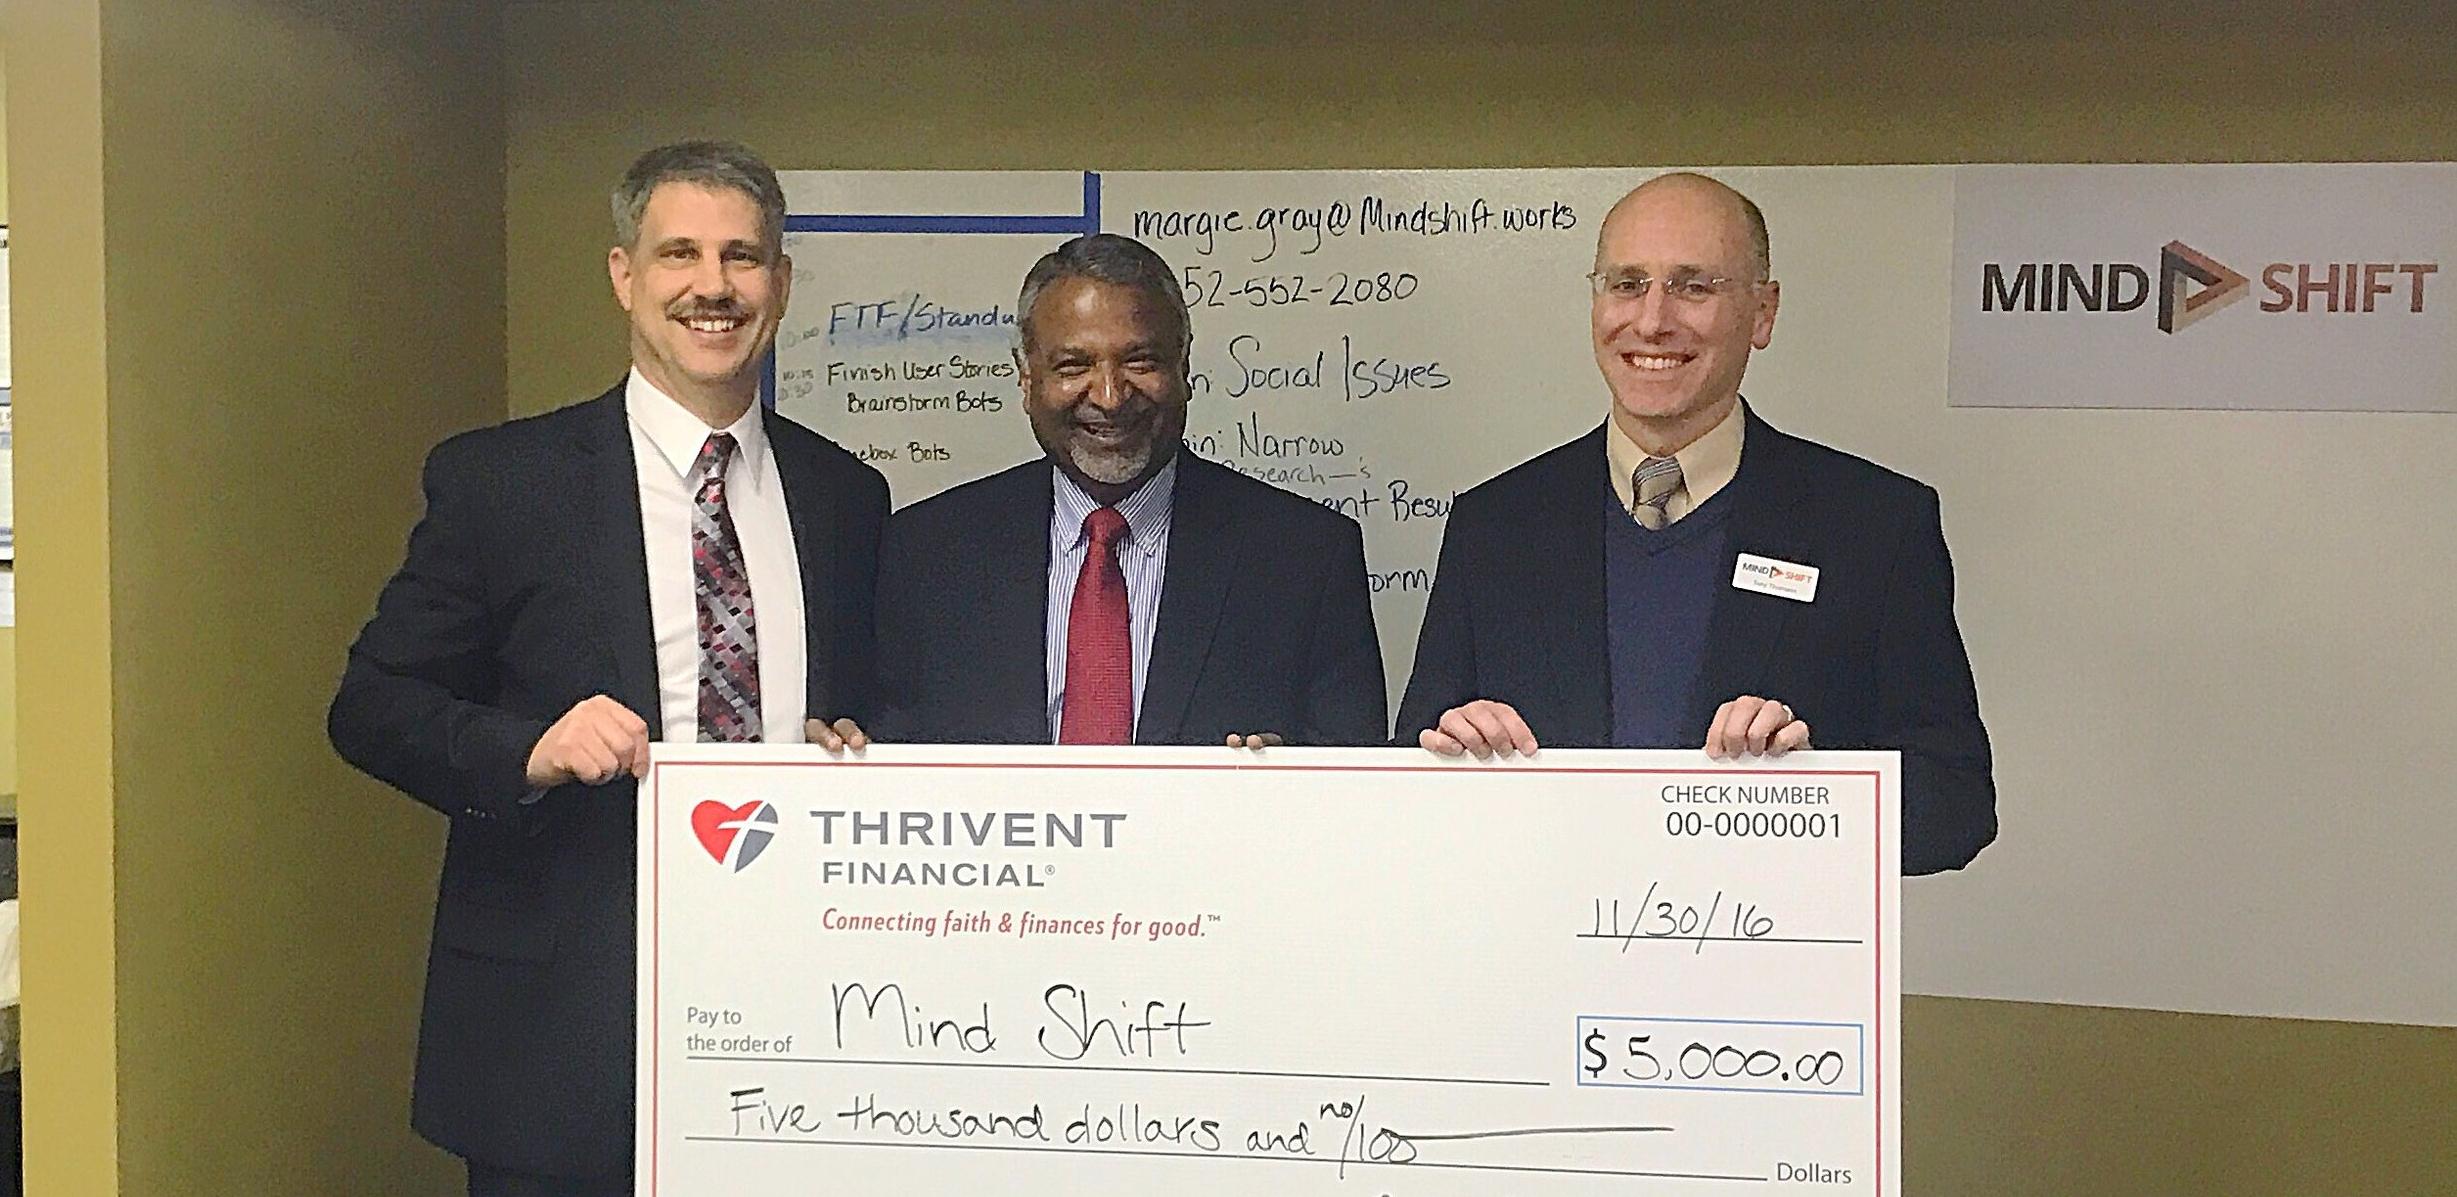 Mike Paulson and Prakash Mathew present Mind Shift's Tony Thomann, with the big check!